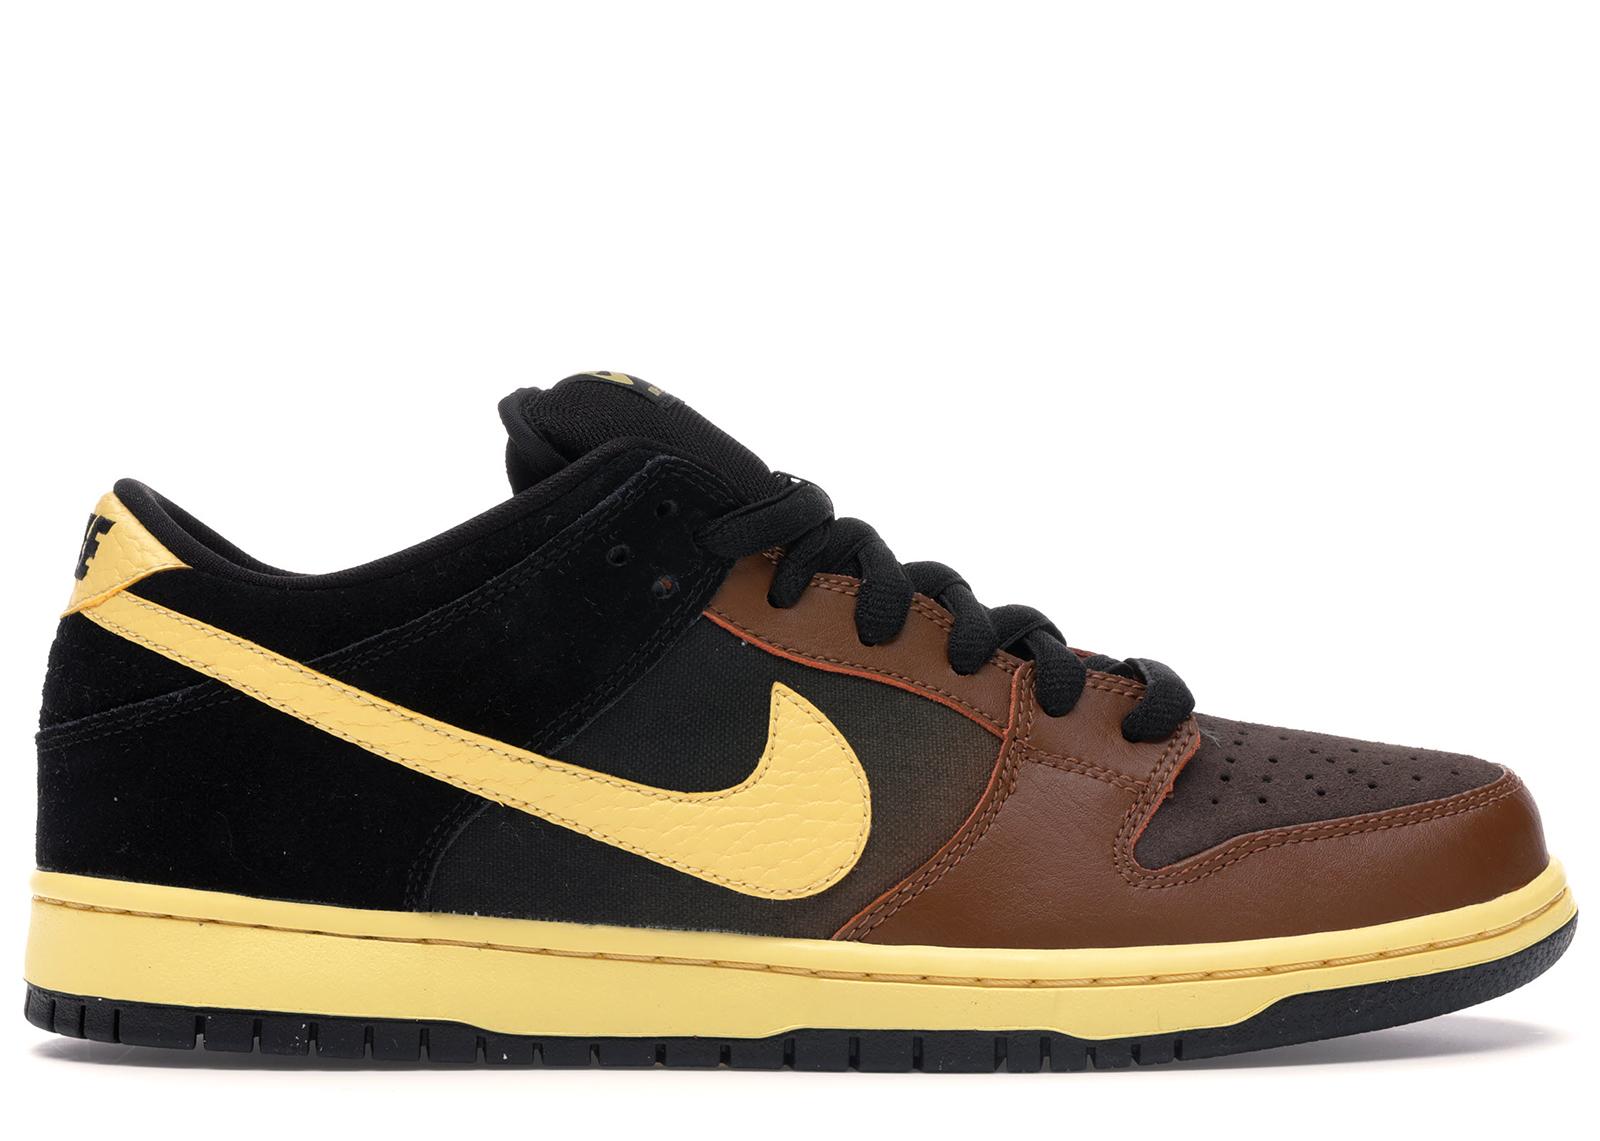 Nike Dunk SB Low Black and Tan - 313170-270